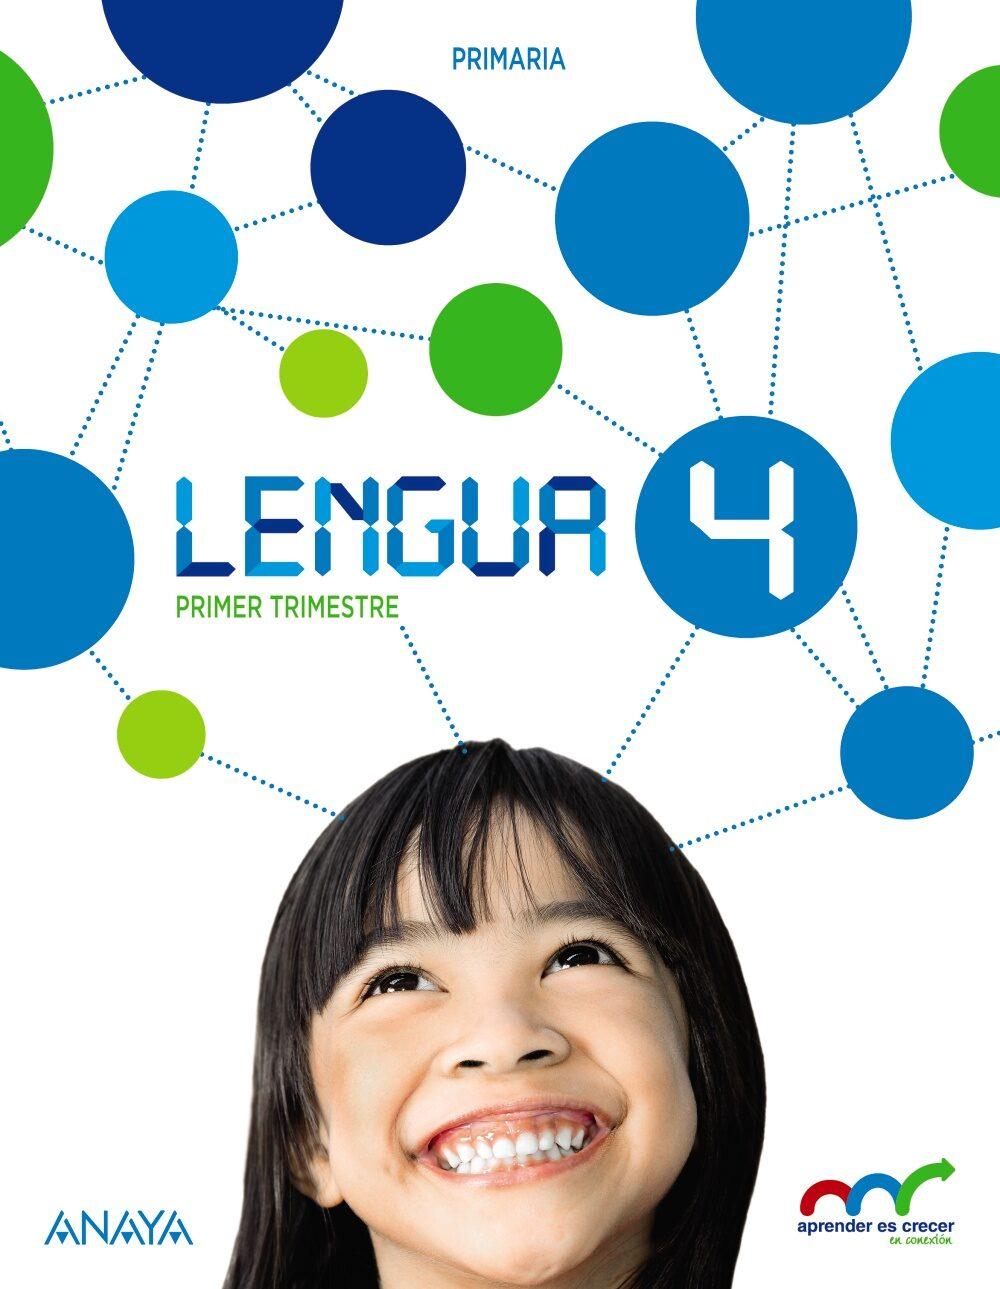 LENGUA 4º EDUCACION PRIMARIA (CON LECTURAS: LOS MISTERIOS DE LUPAS 4)  ANDALUCIA / CASTILLA LEON   VV.AA.   Comprar libro 9788467878899